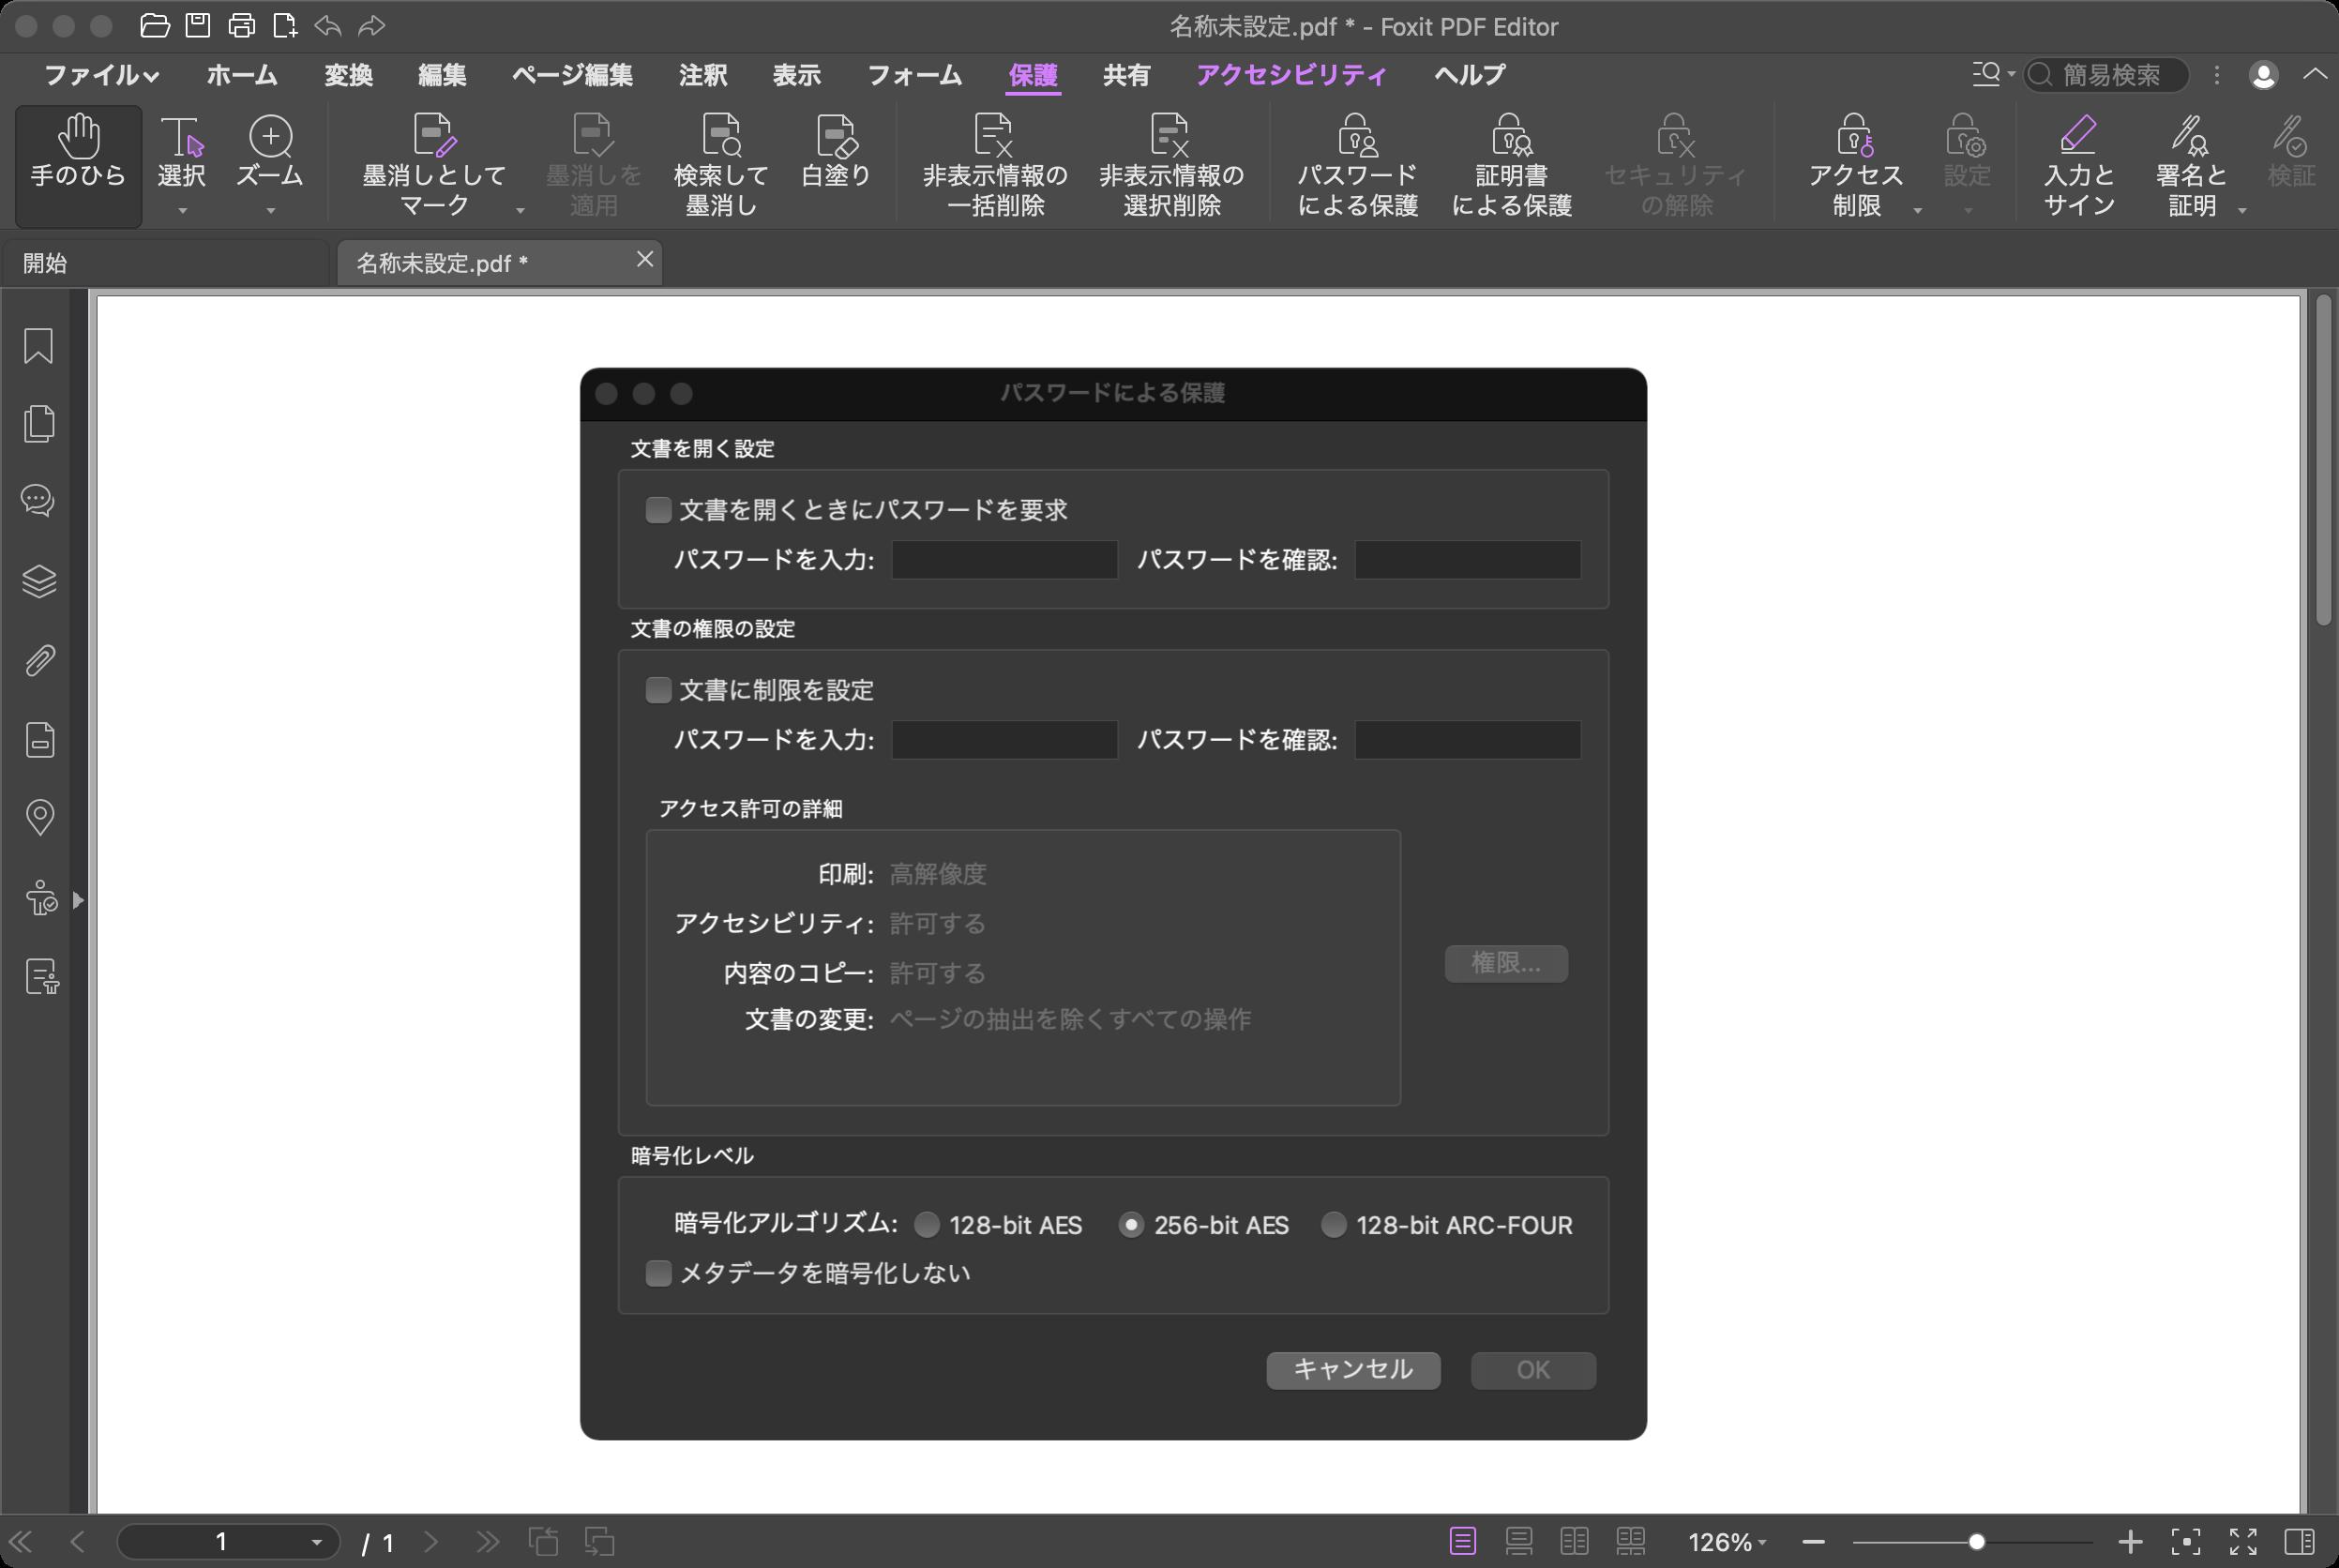 Foxit PDF Editor パスワード